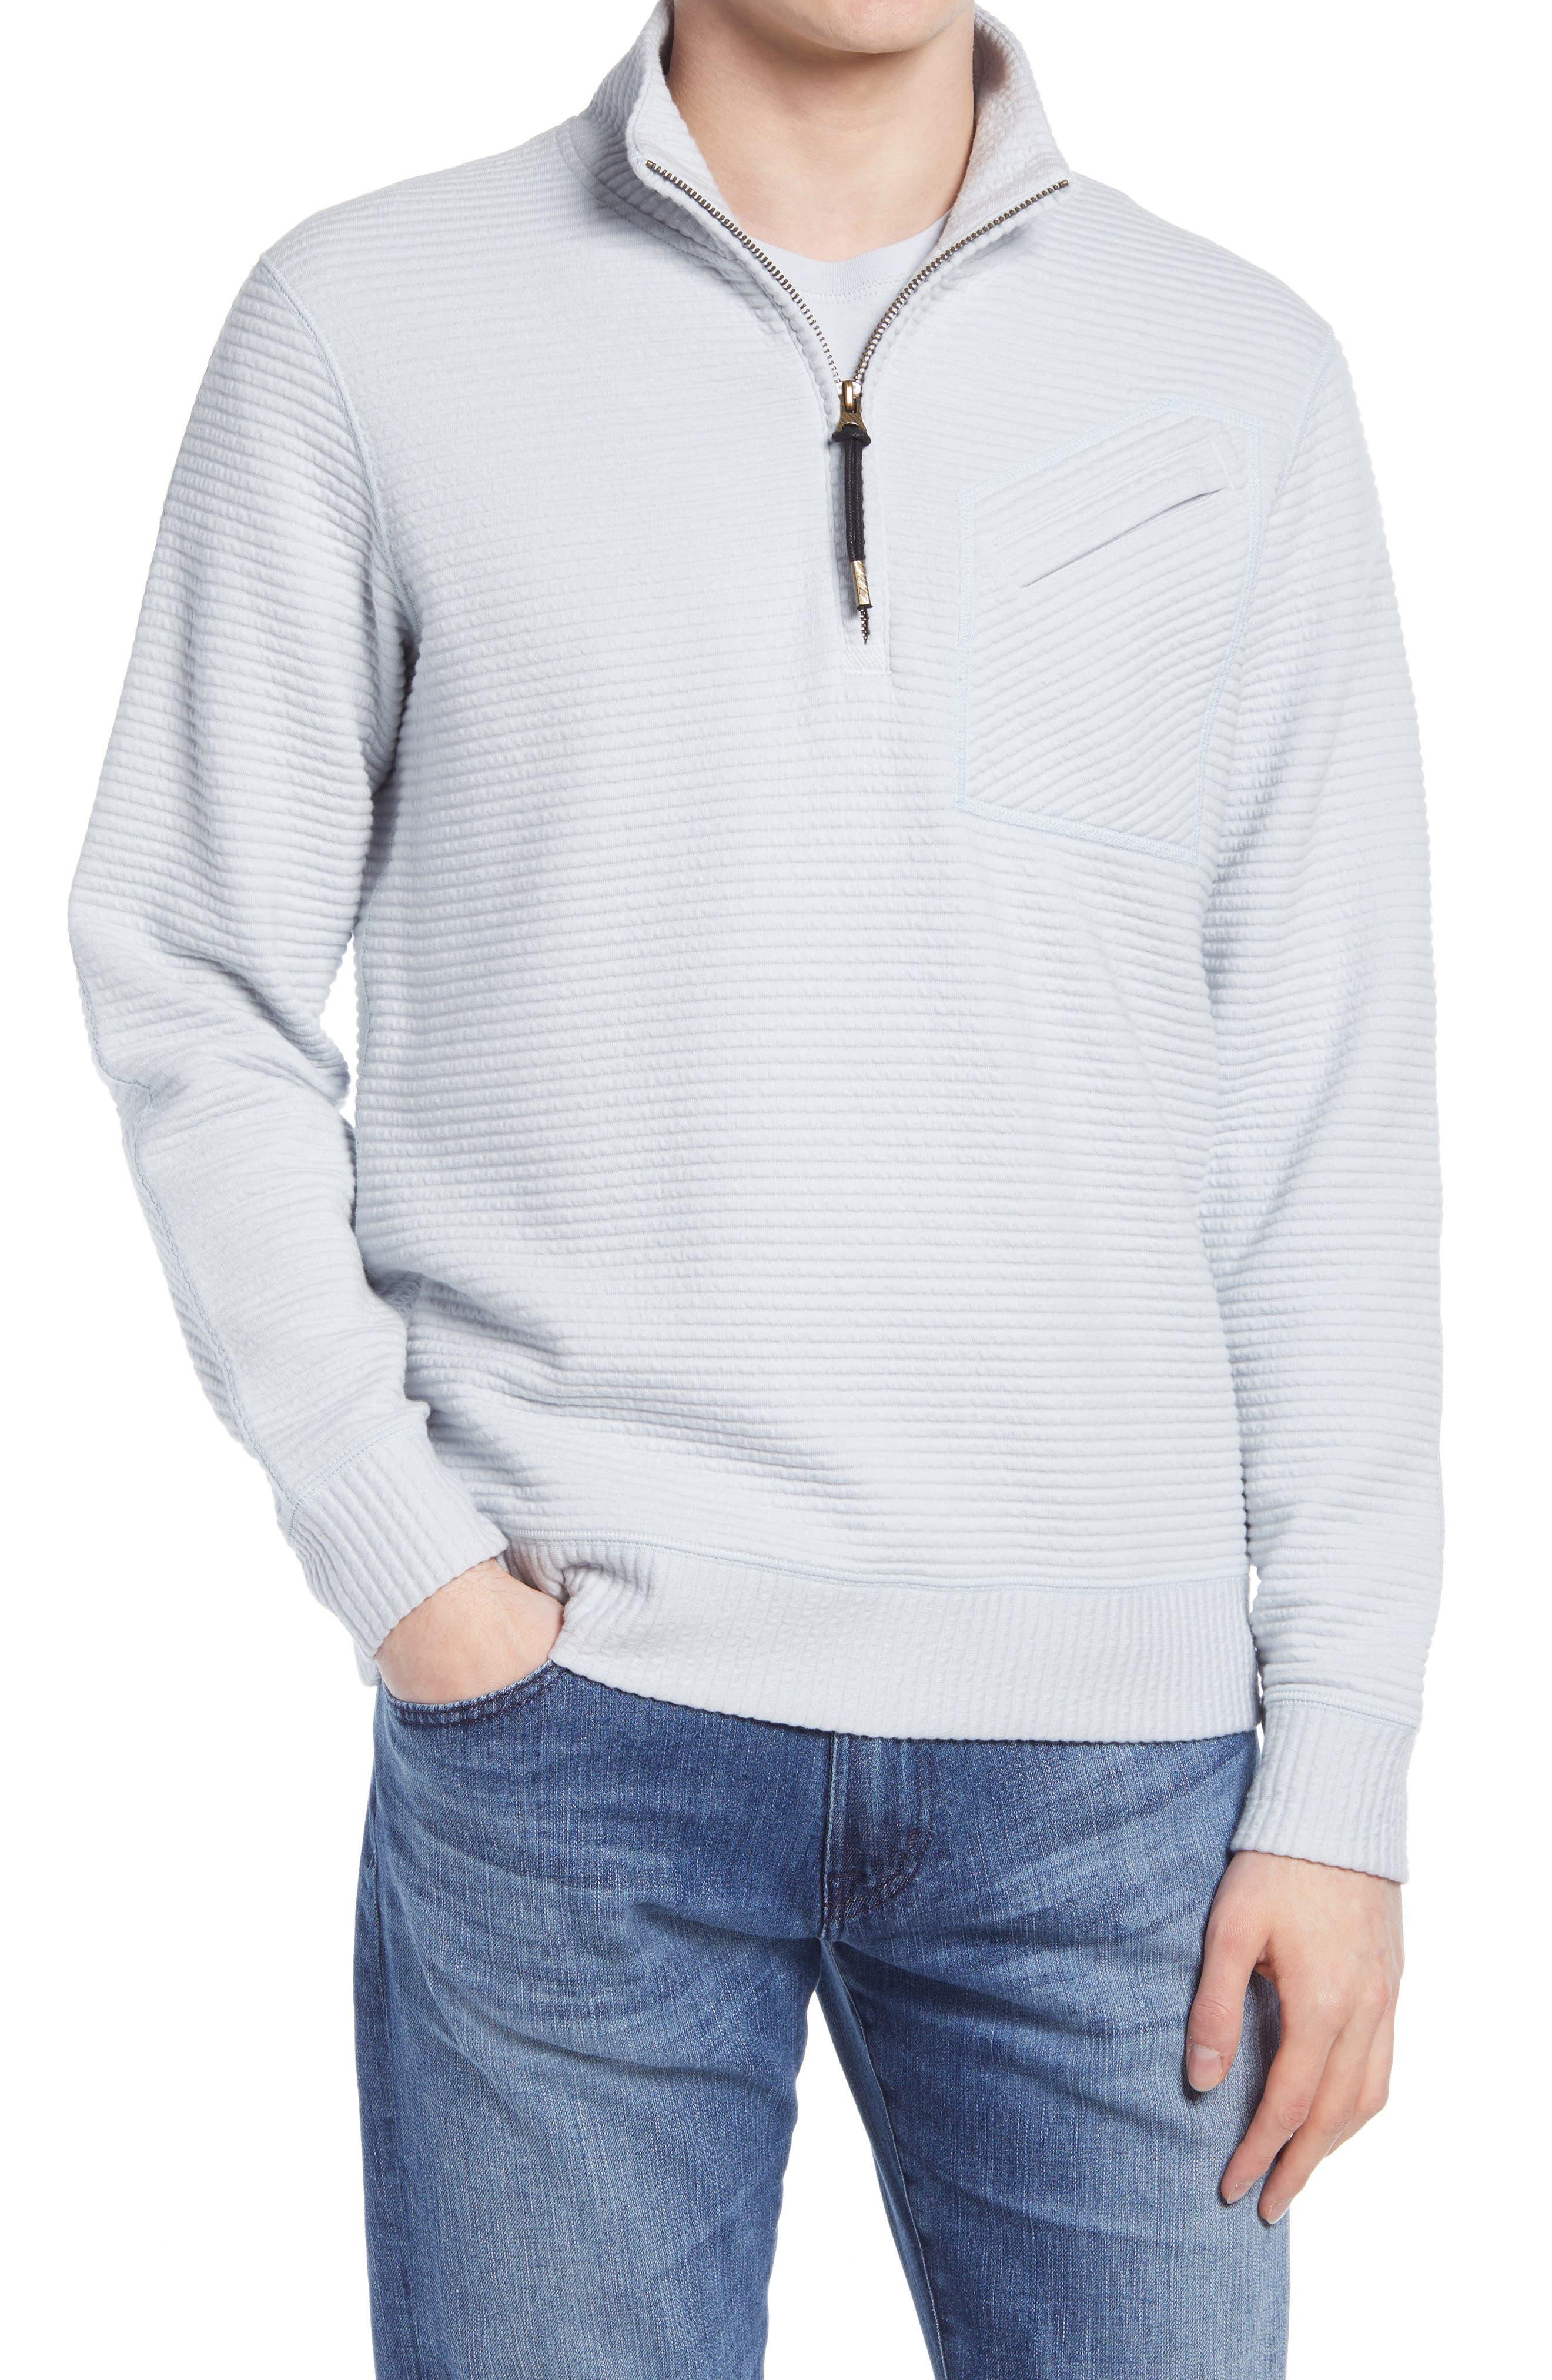 Double Knit Half-Zip Pullover